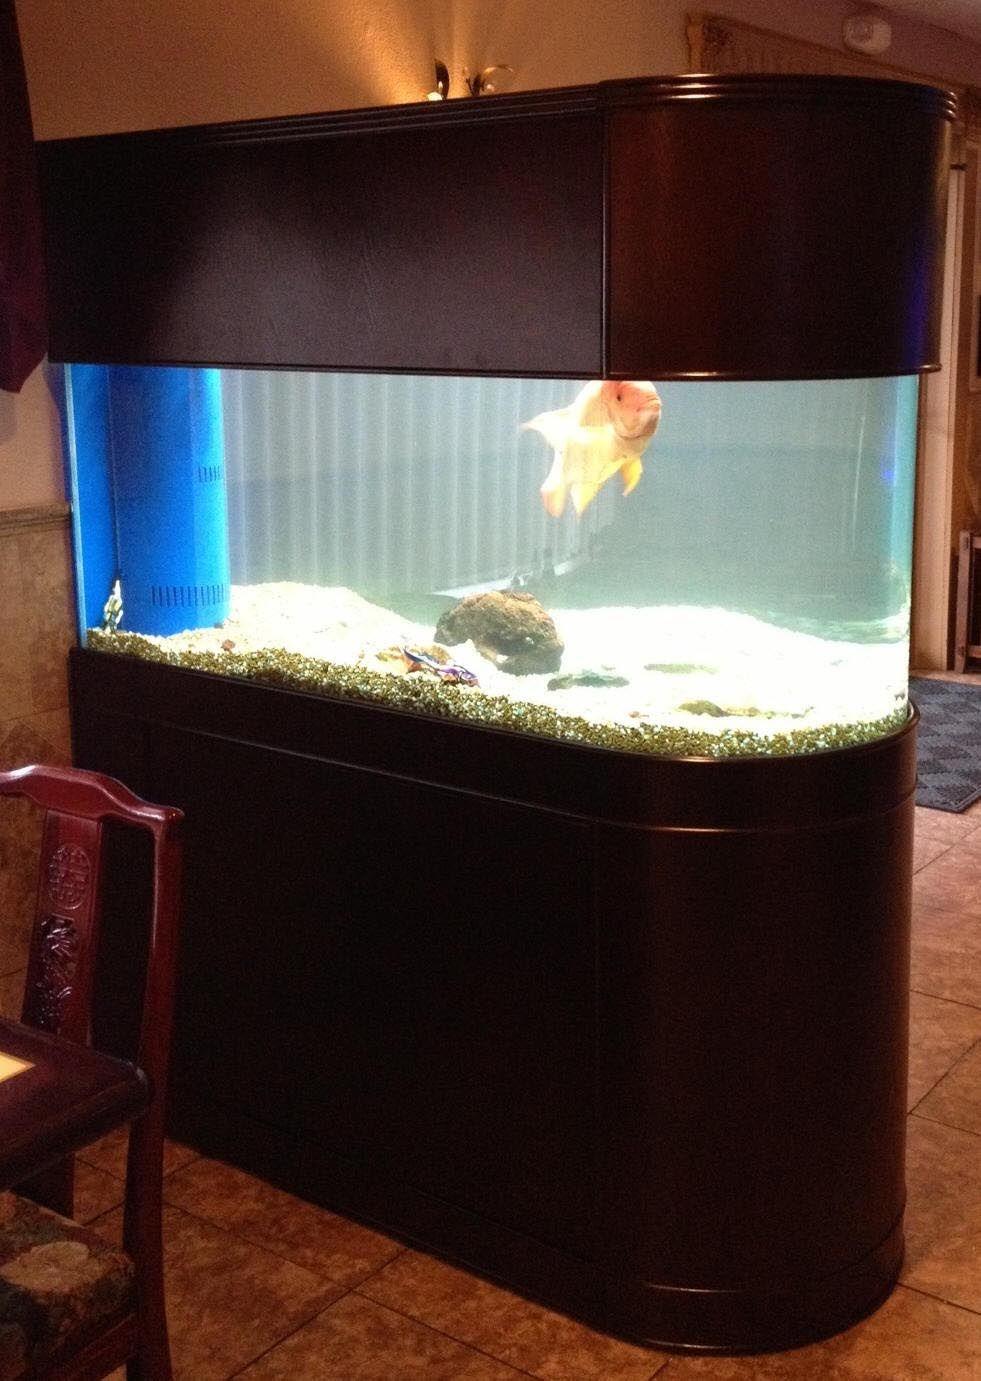 100 Gallon Bow Front Aquarium Dimensions Bow Front Aquarium Aquarium Stand Aquarium Stands